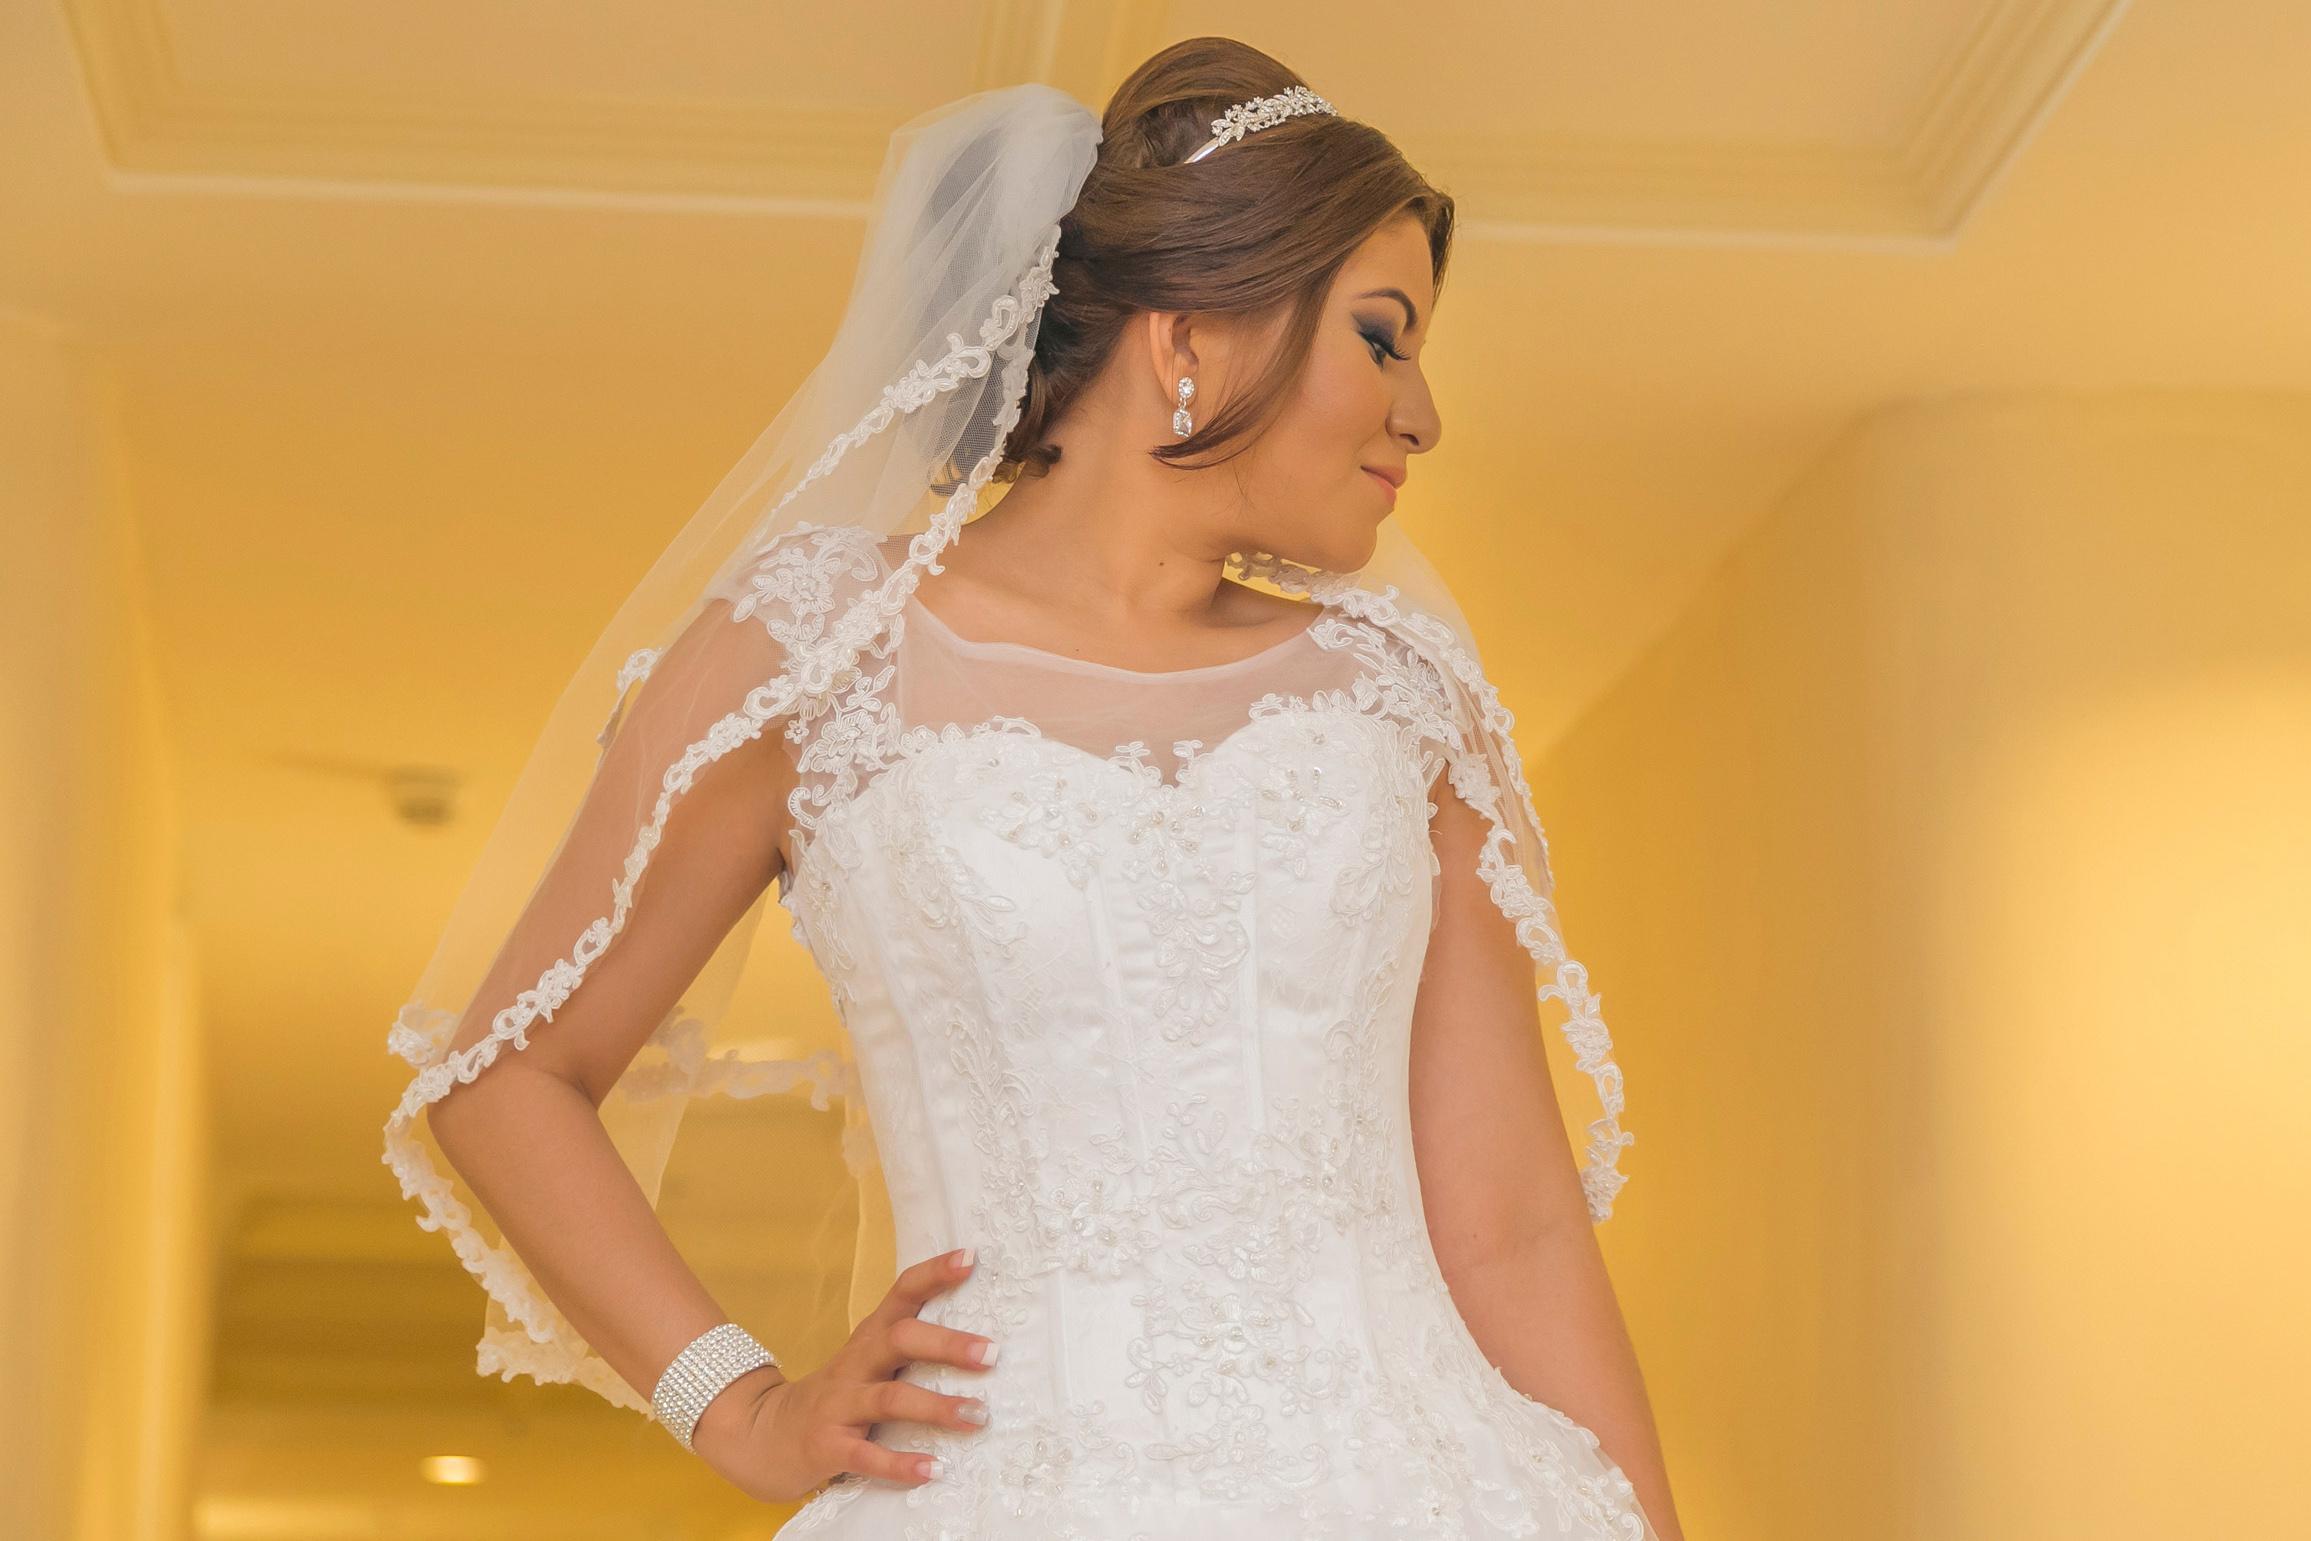 Mike_Mendez_Photography_Wedding_Engagements_17